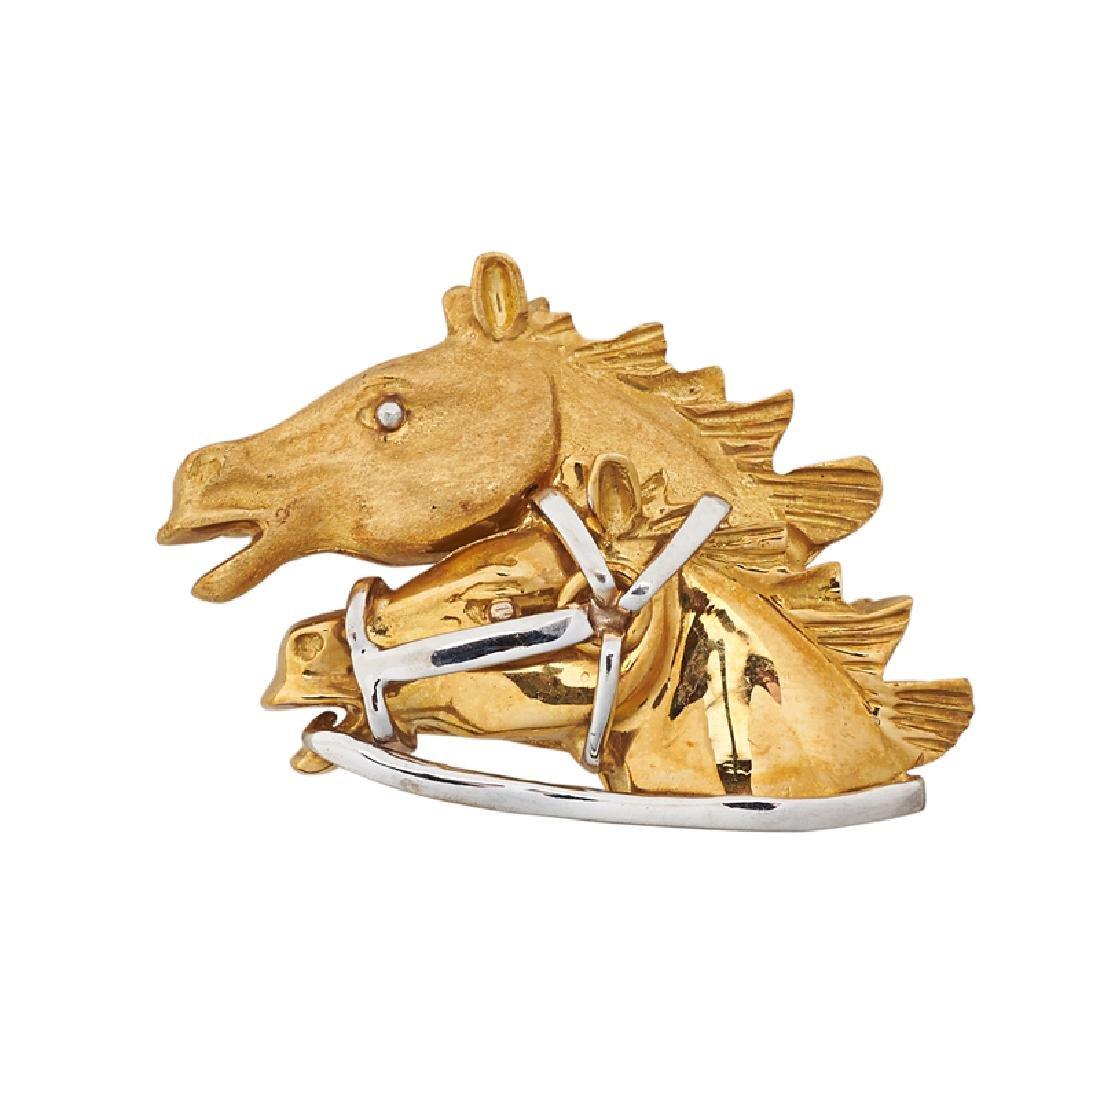 YELLOW GOLD HORSE HEAD BROOCH